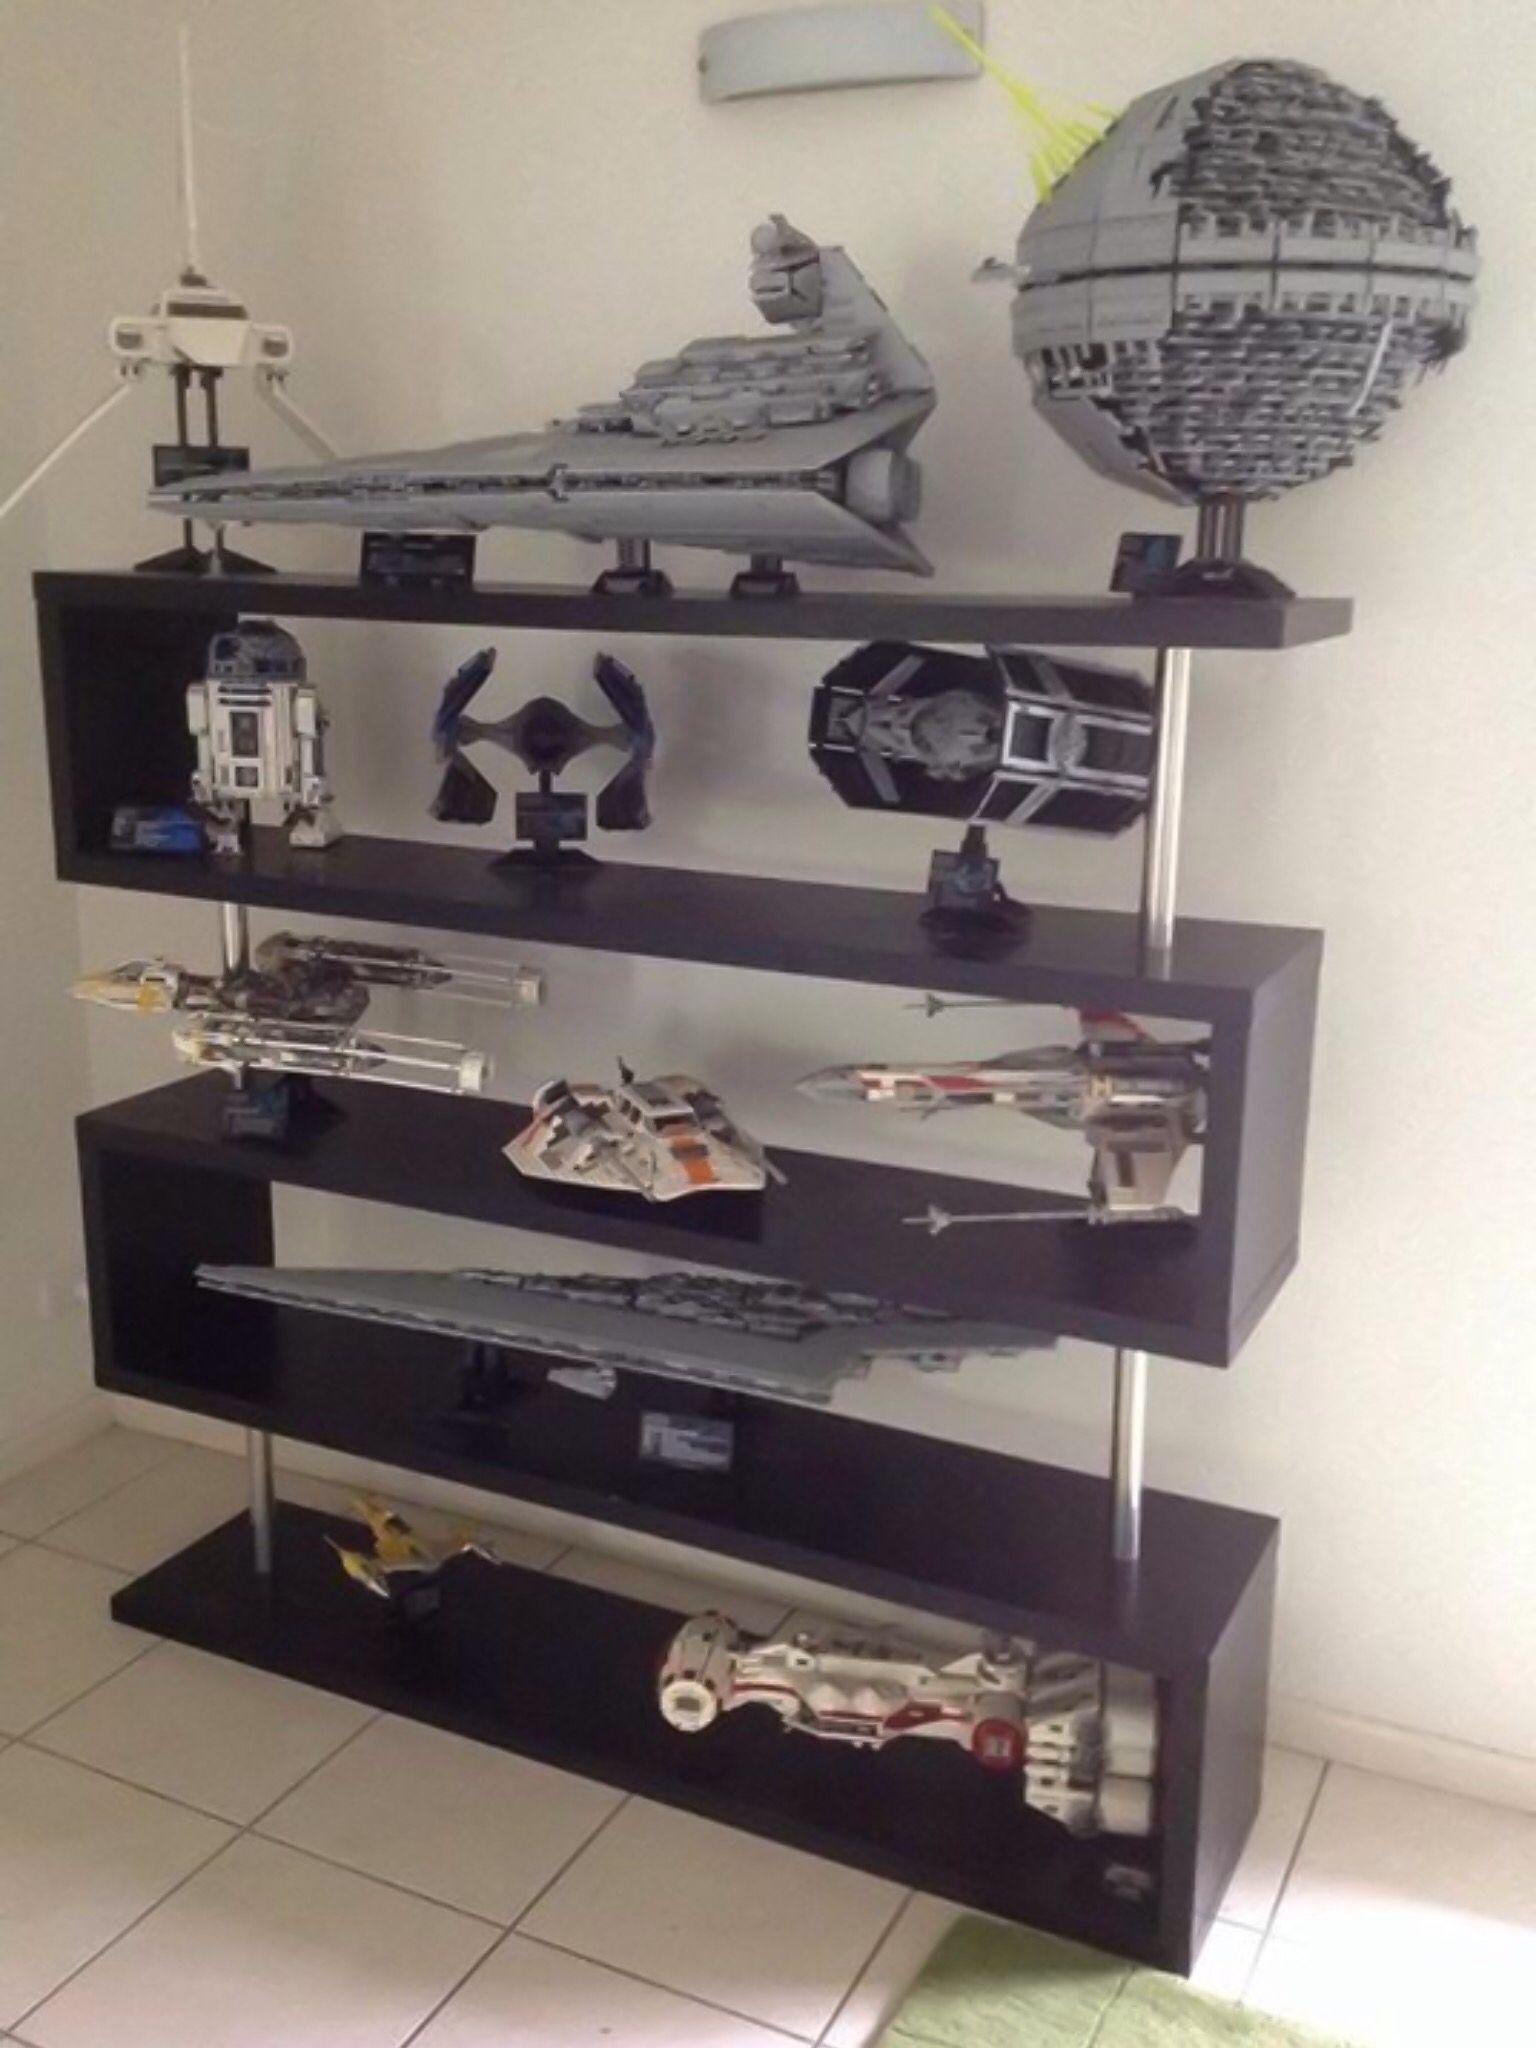 Lego Star Wars Display Star Wars Pinterest Lego Star Wars And